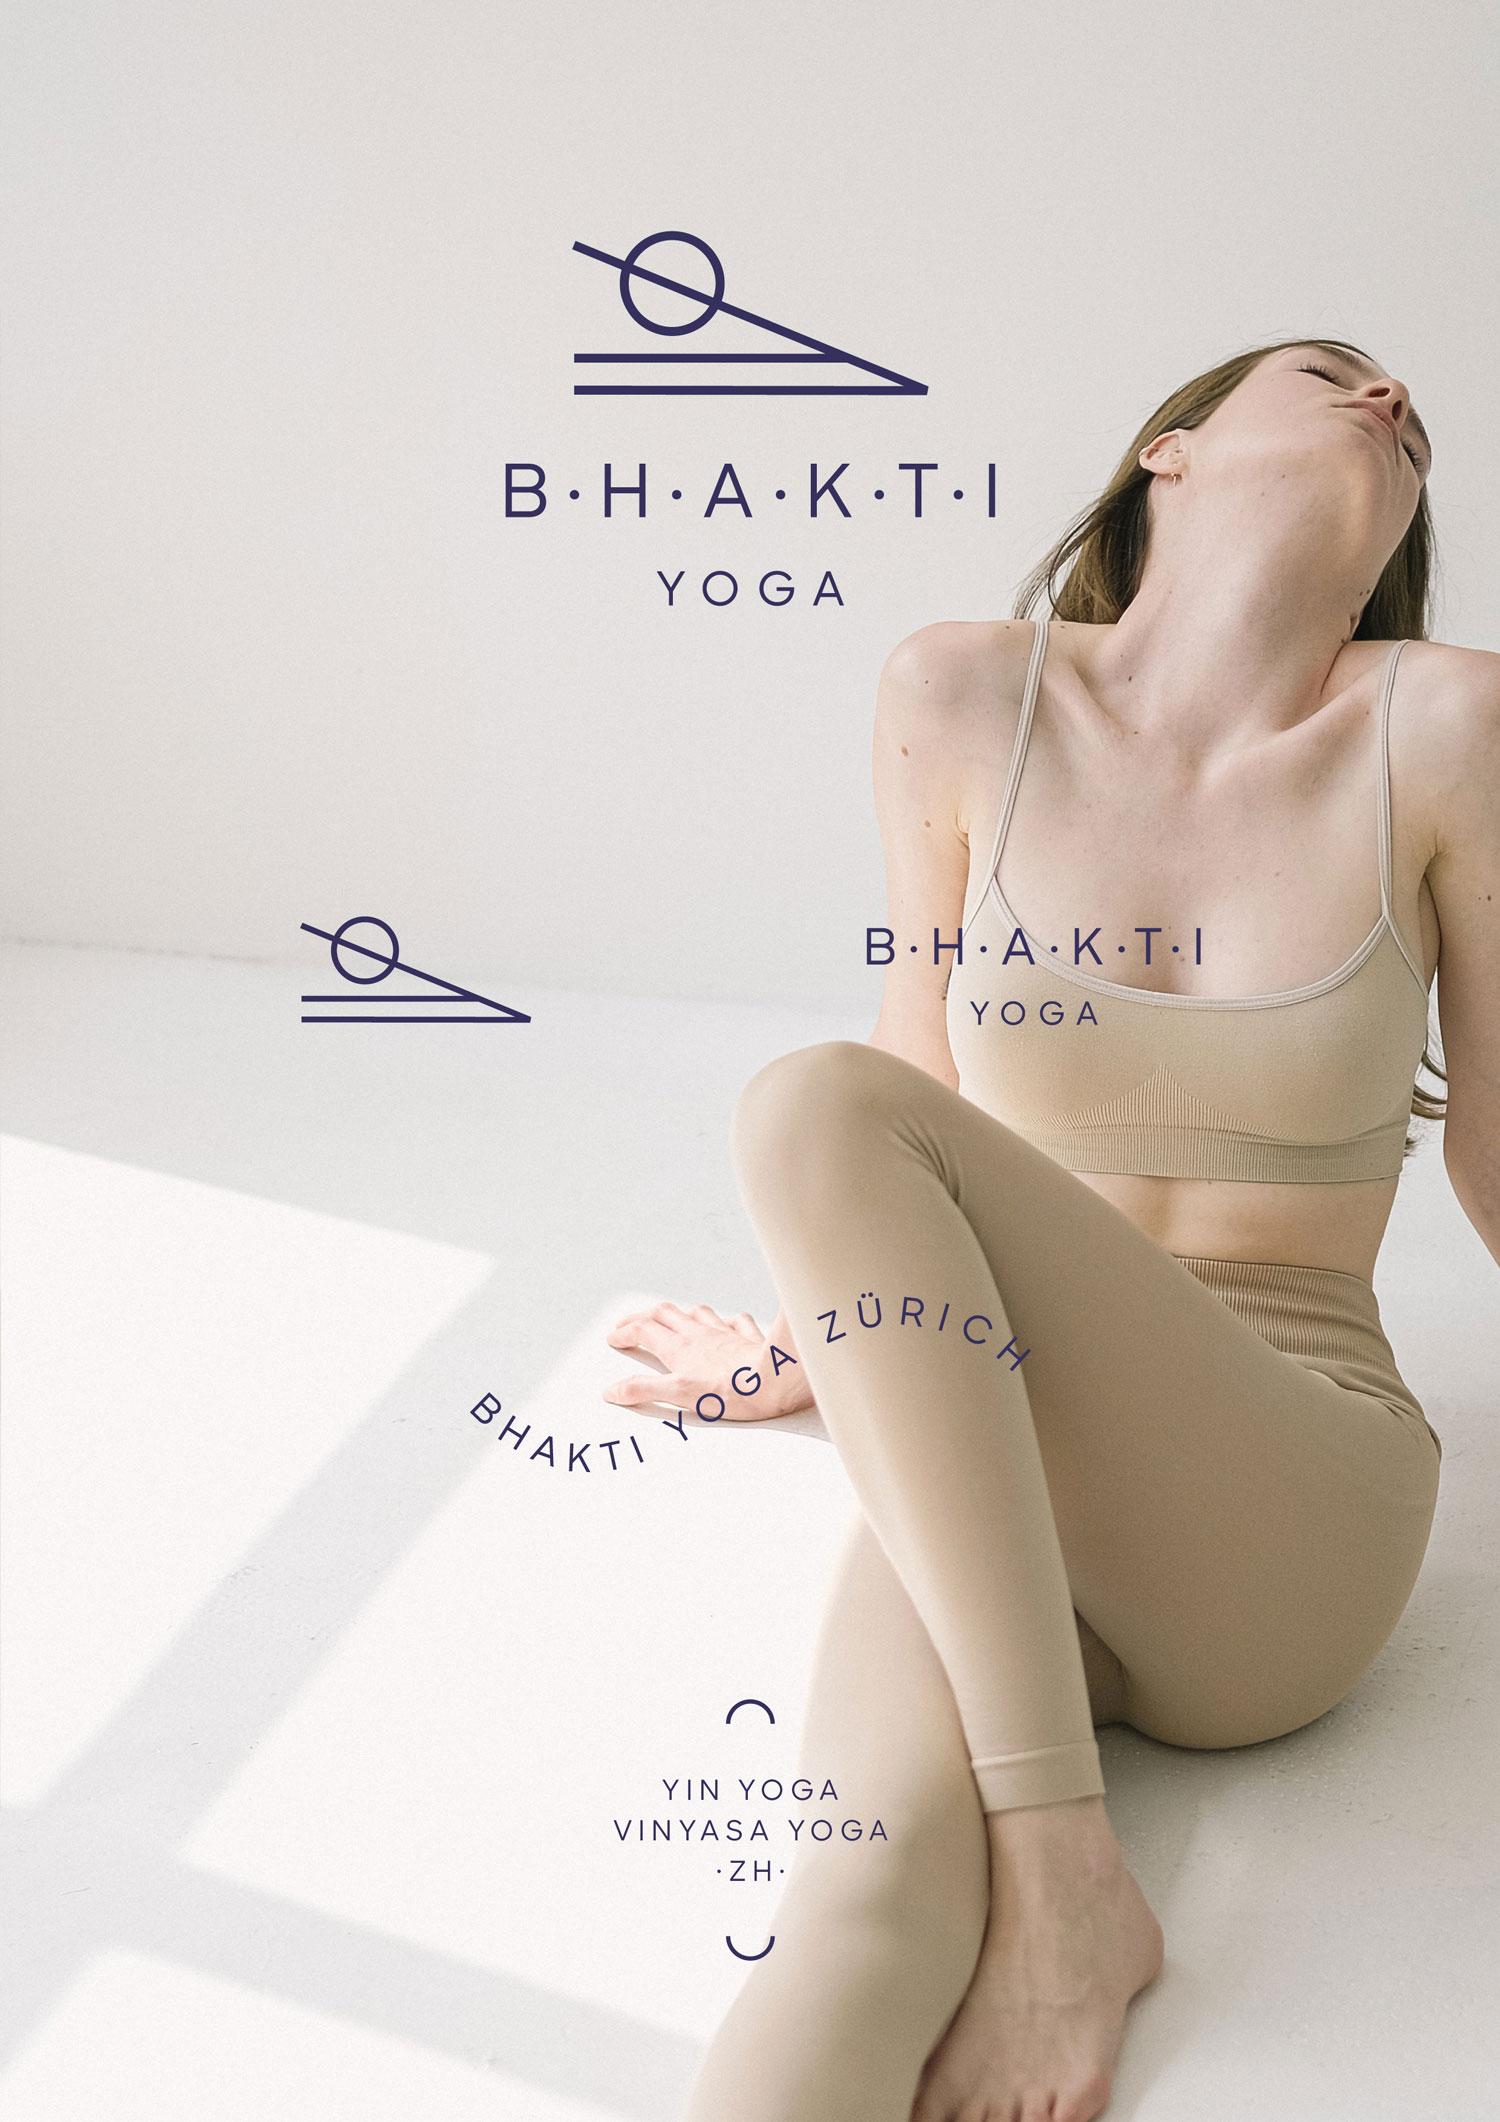 Bhakti Yoga Branding + Logo Suite by Mindt